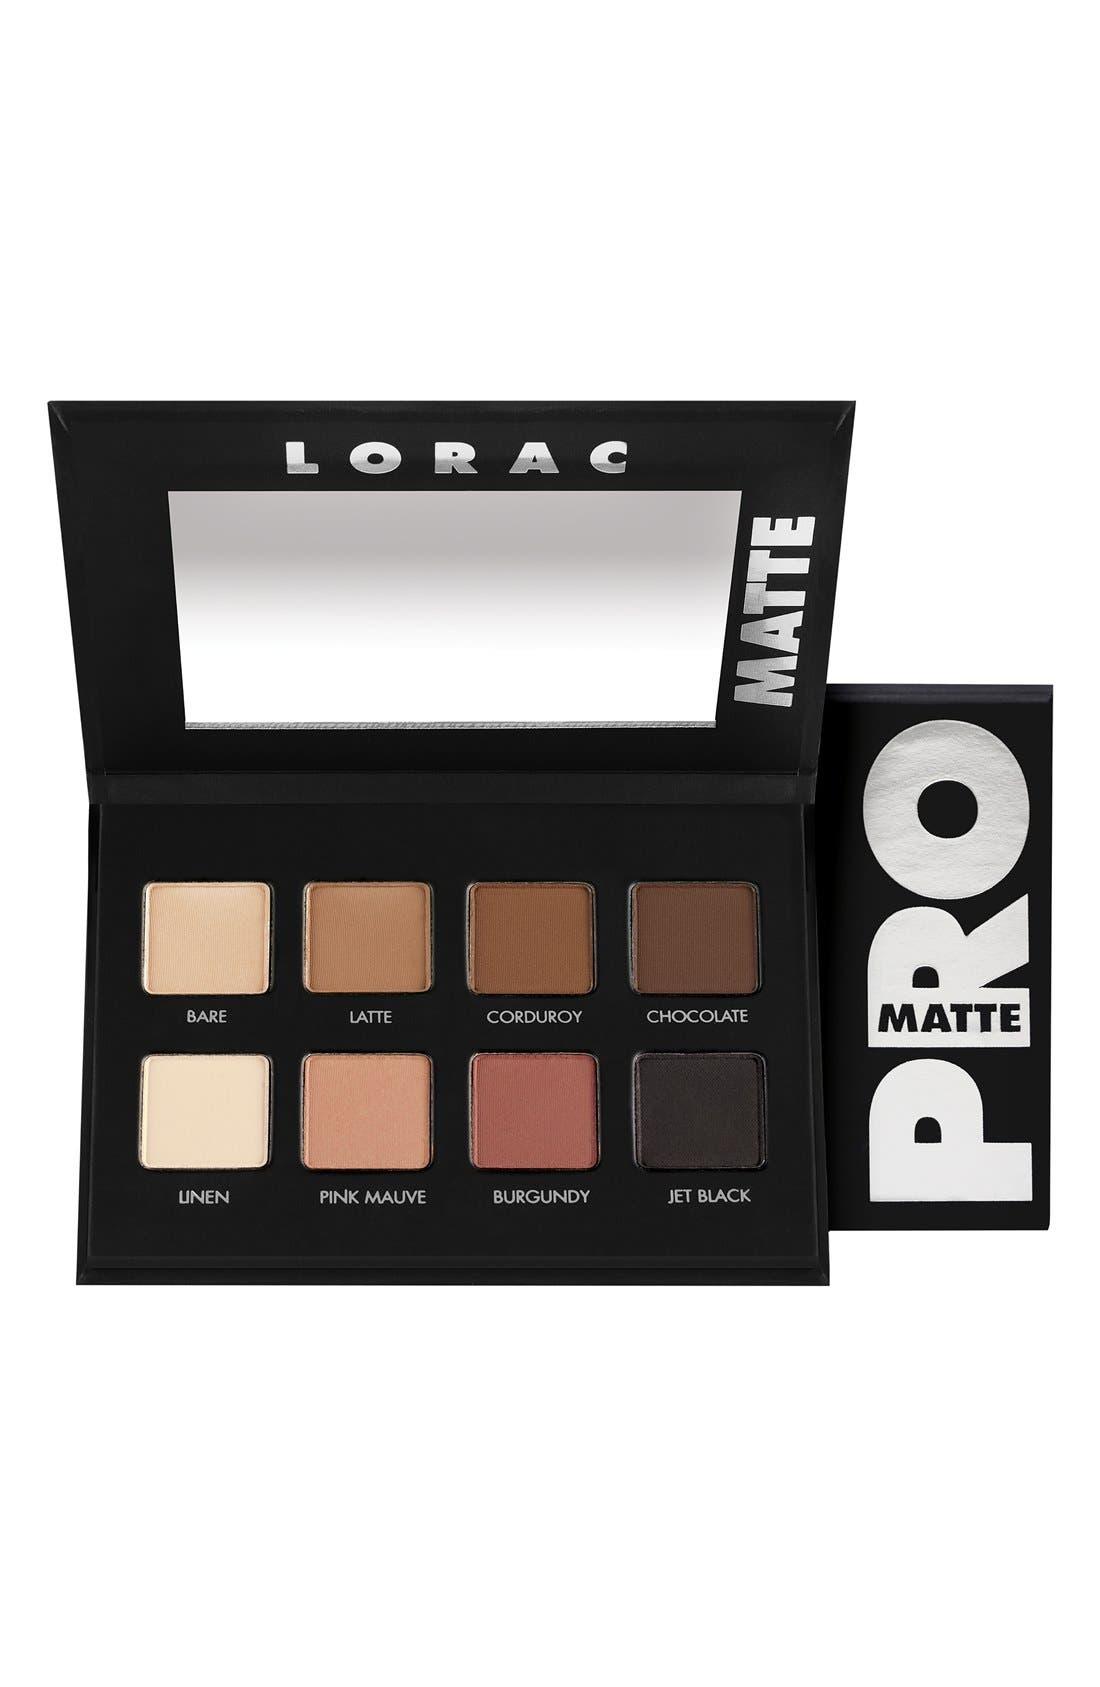 'PRO' Matte Eyeshadow Palette,                             Main thumbnail 1, color,                             000